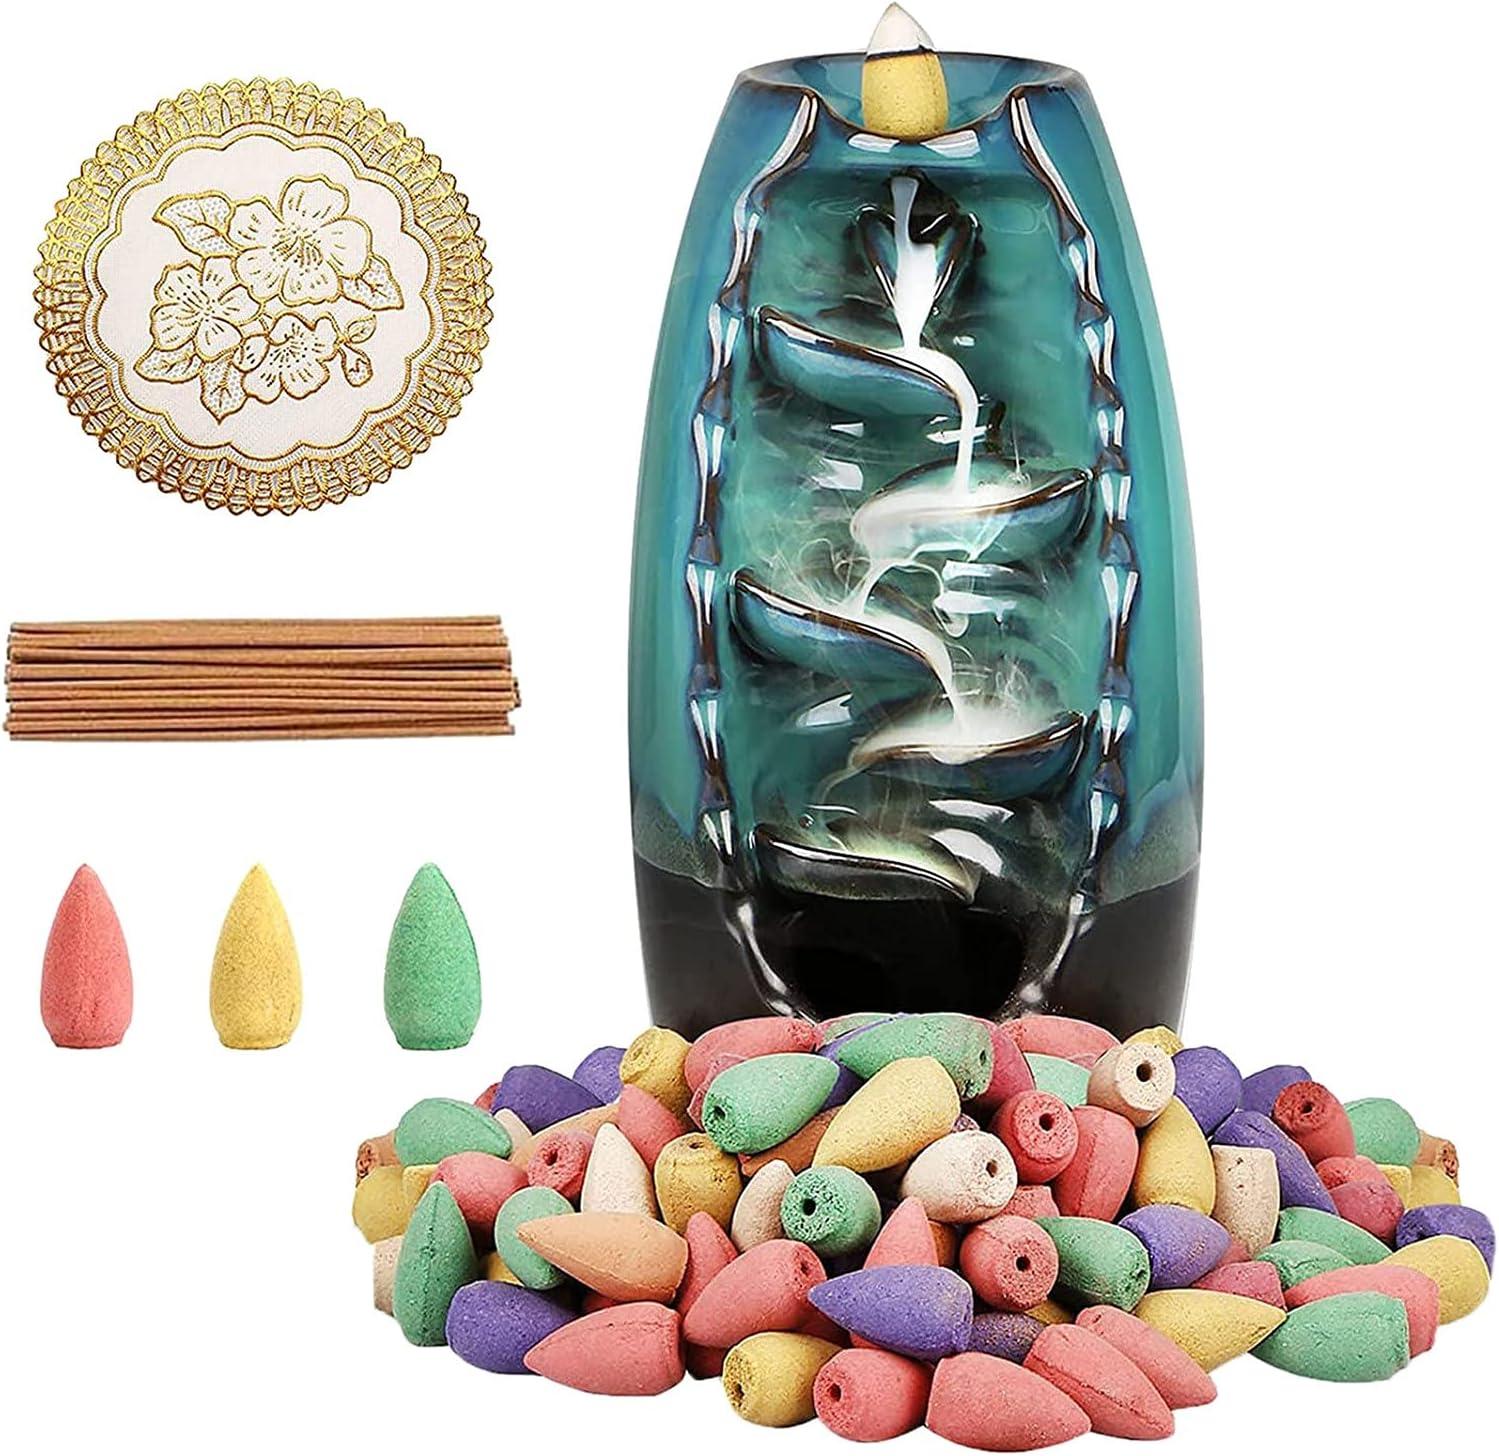 Waterfall Incense Japan Maker Max 66% OFF New Burner Ceramic In Inscents Set Backflow